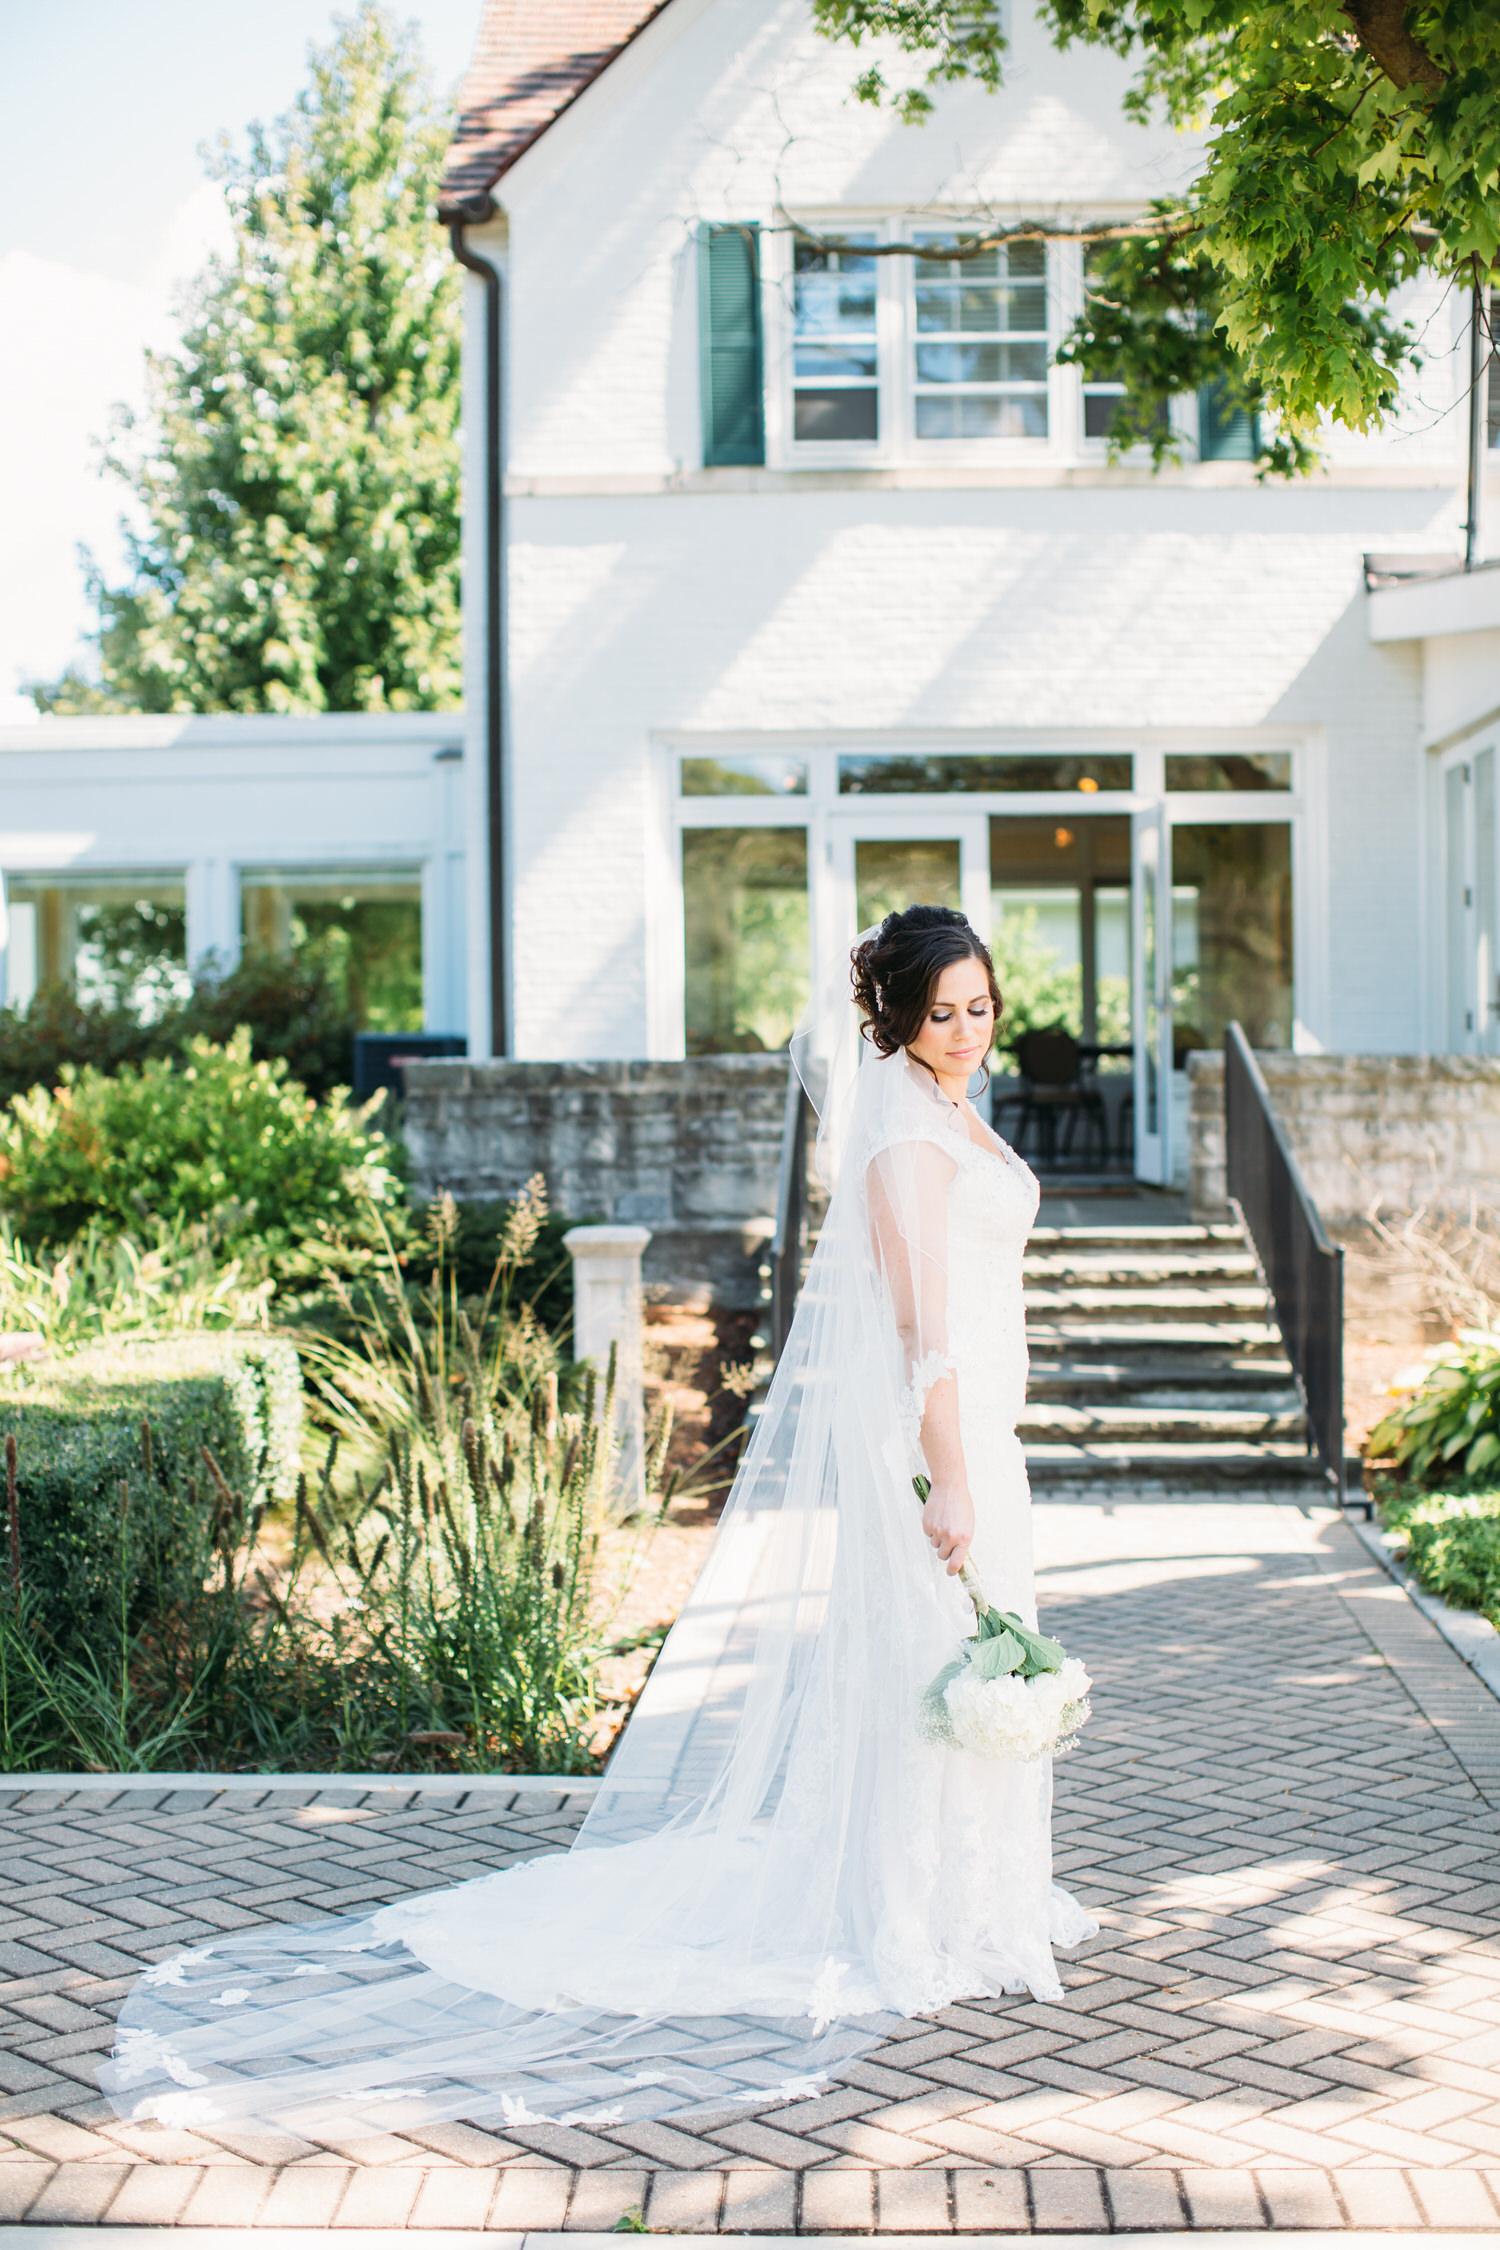 Chicago bride, Chicago wedding photographer